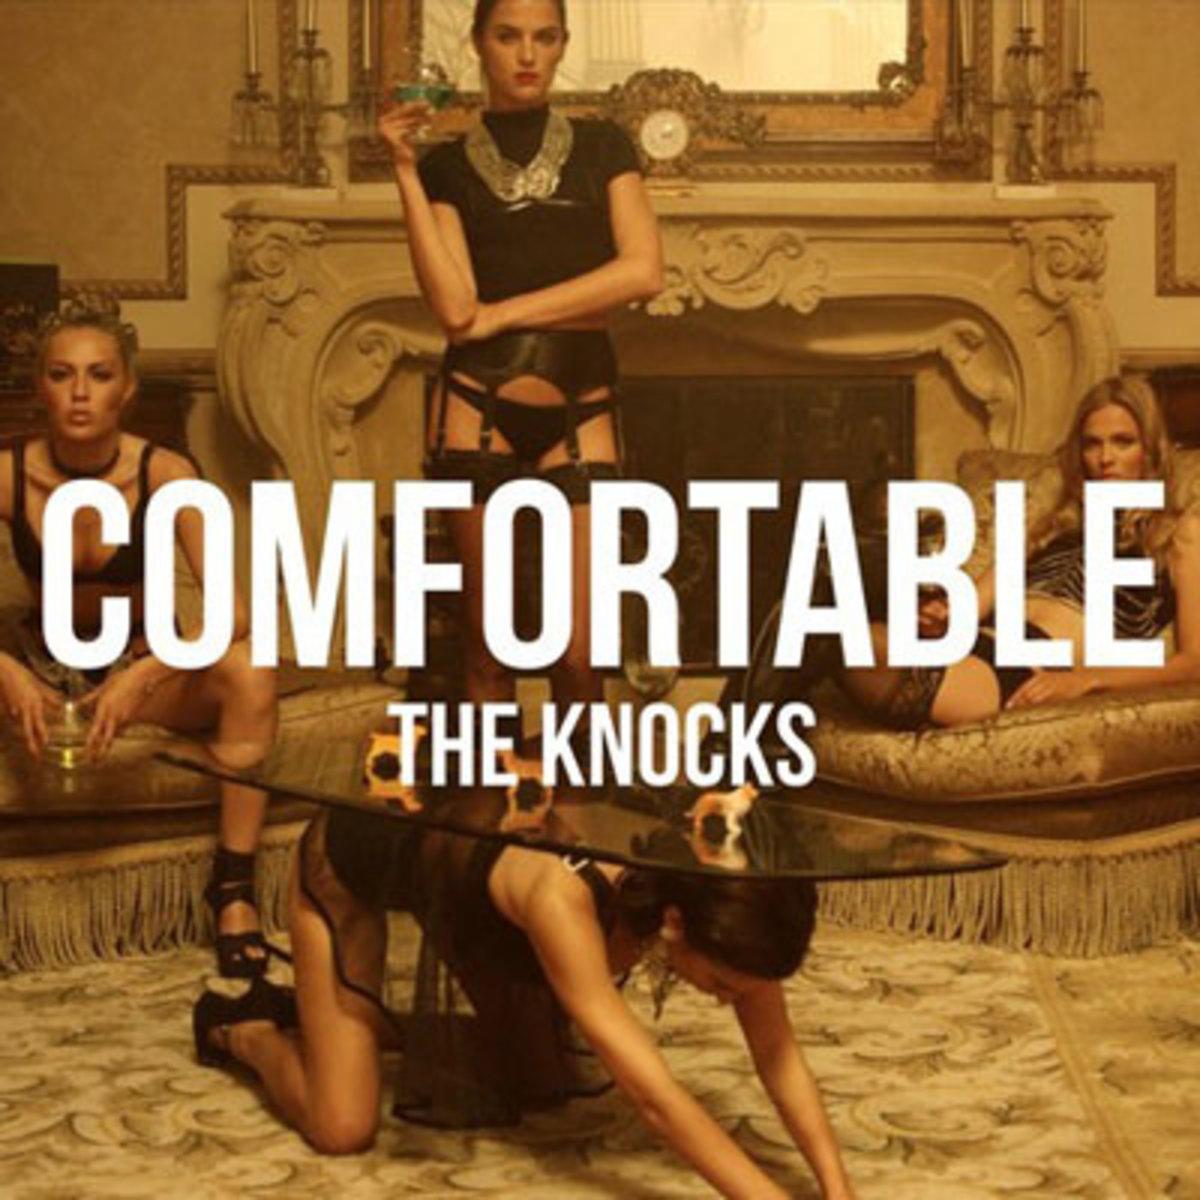 theknocks-comfortable.jpg